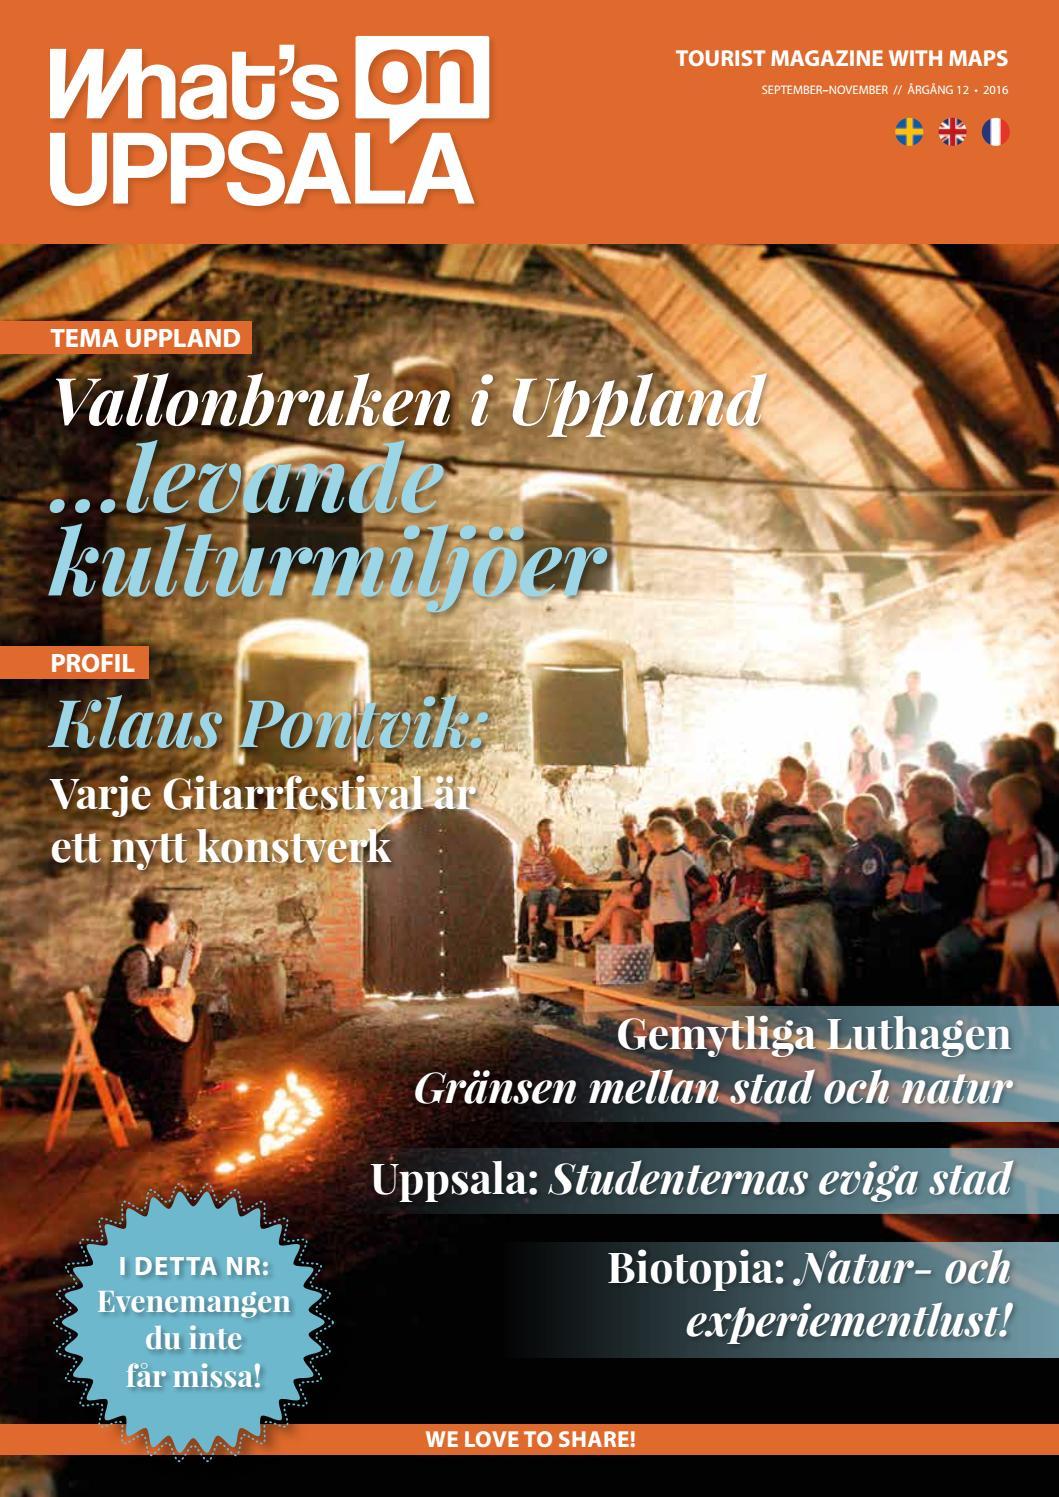 the ark botaniska uppsala - Better Clinics